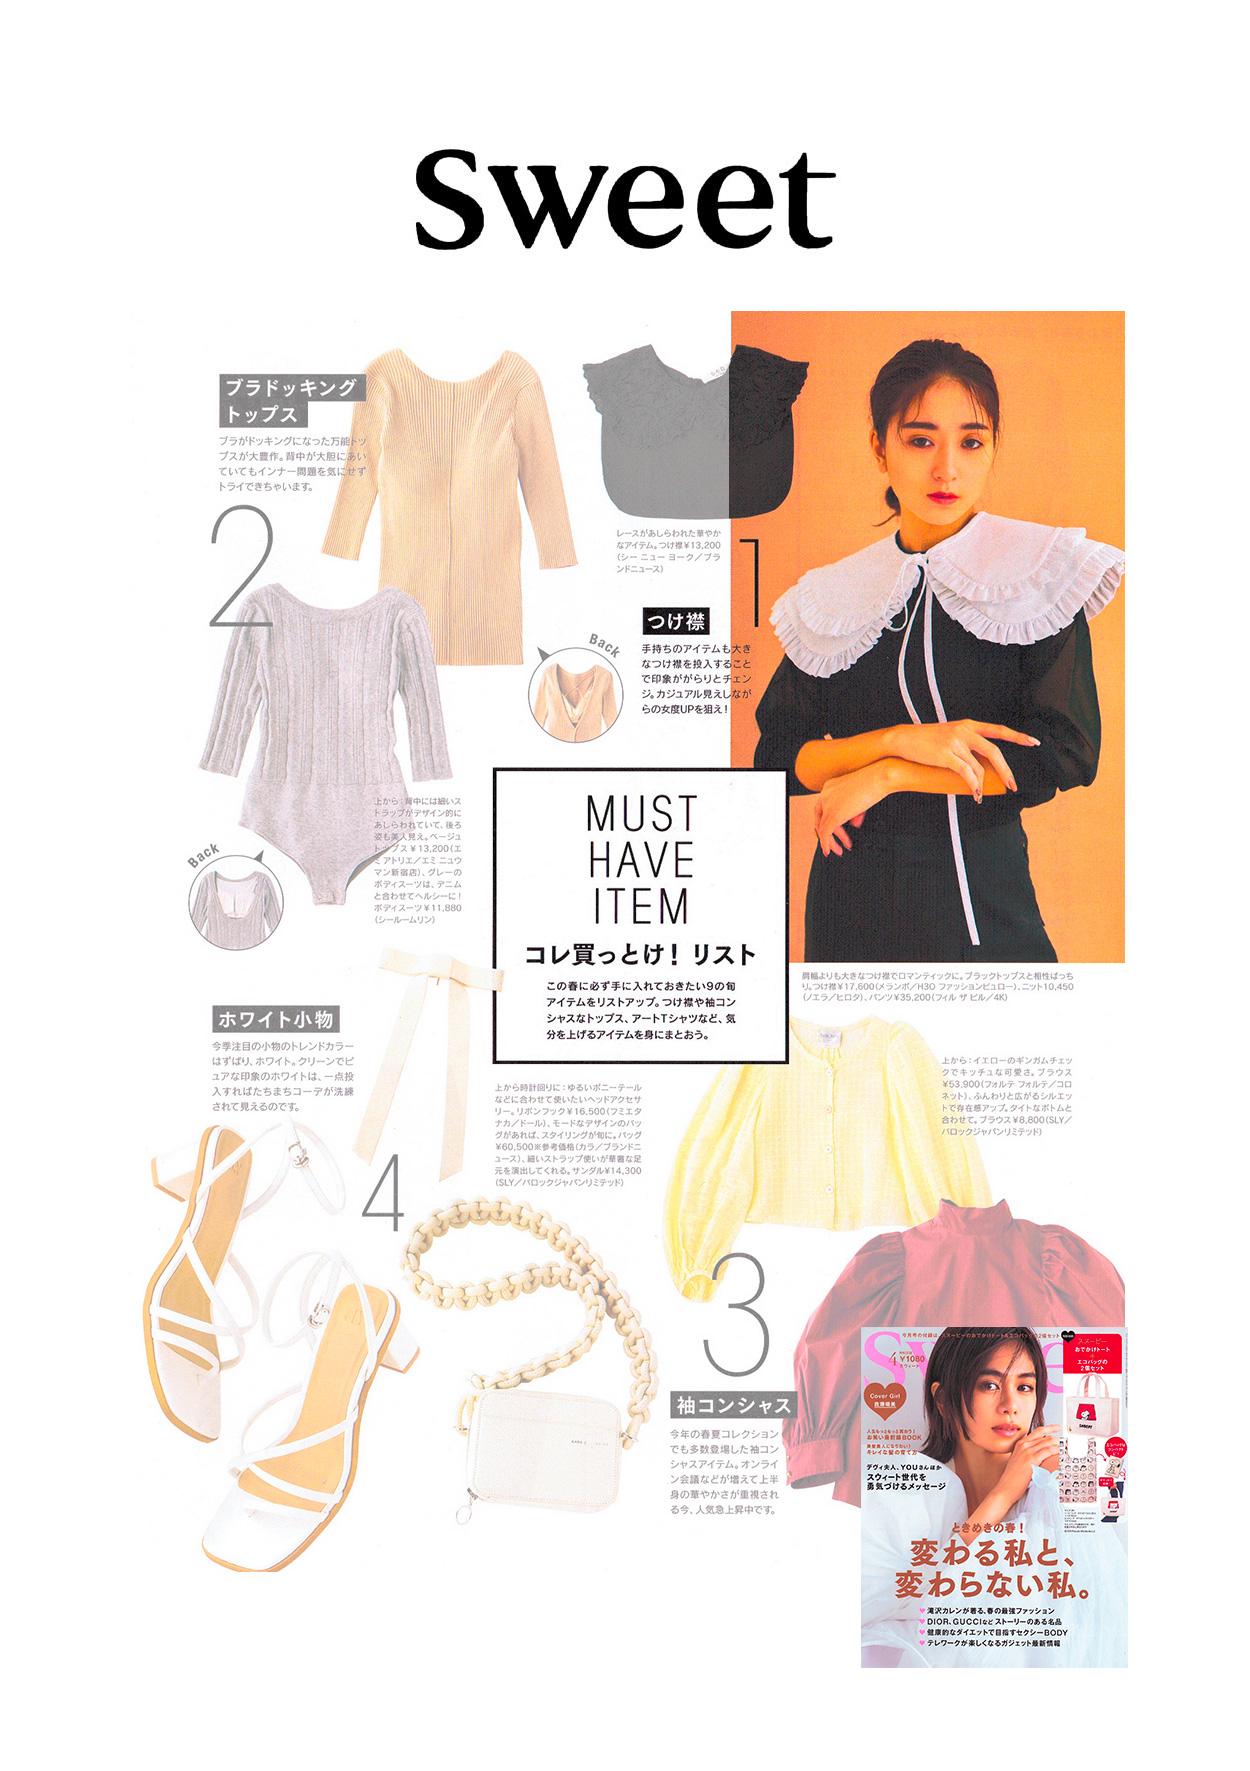 melampo press on sweet magazine6